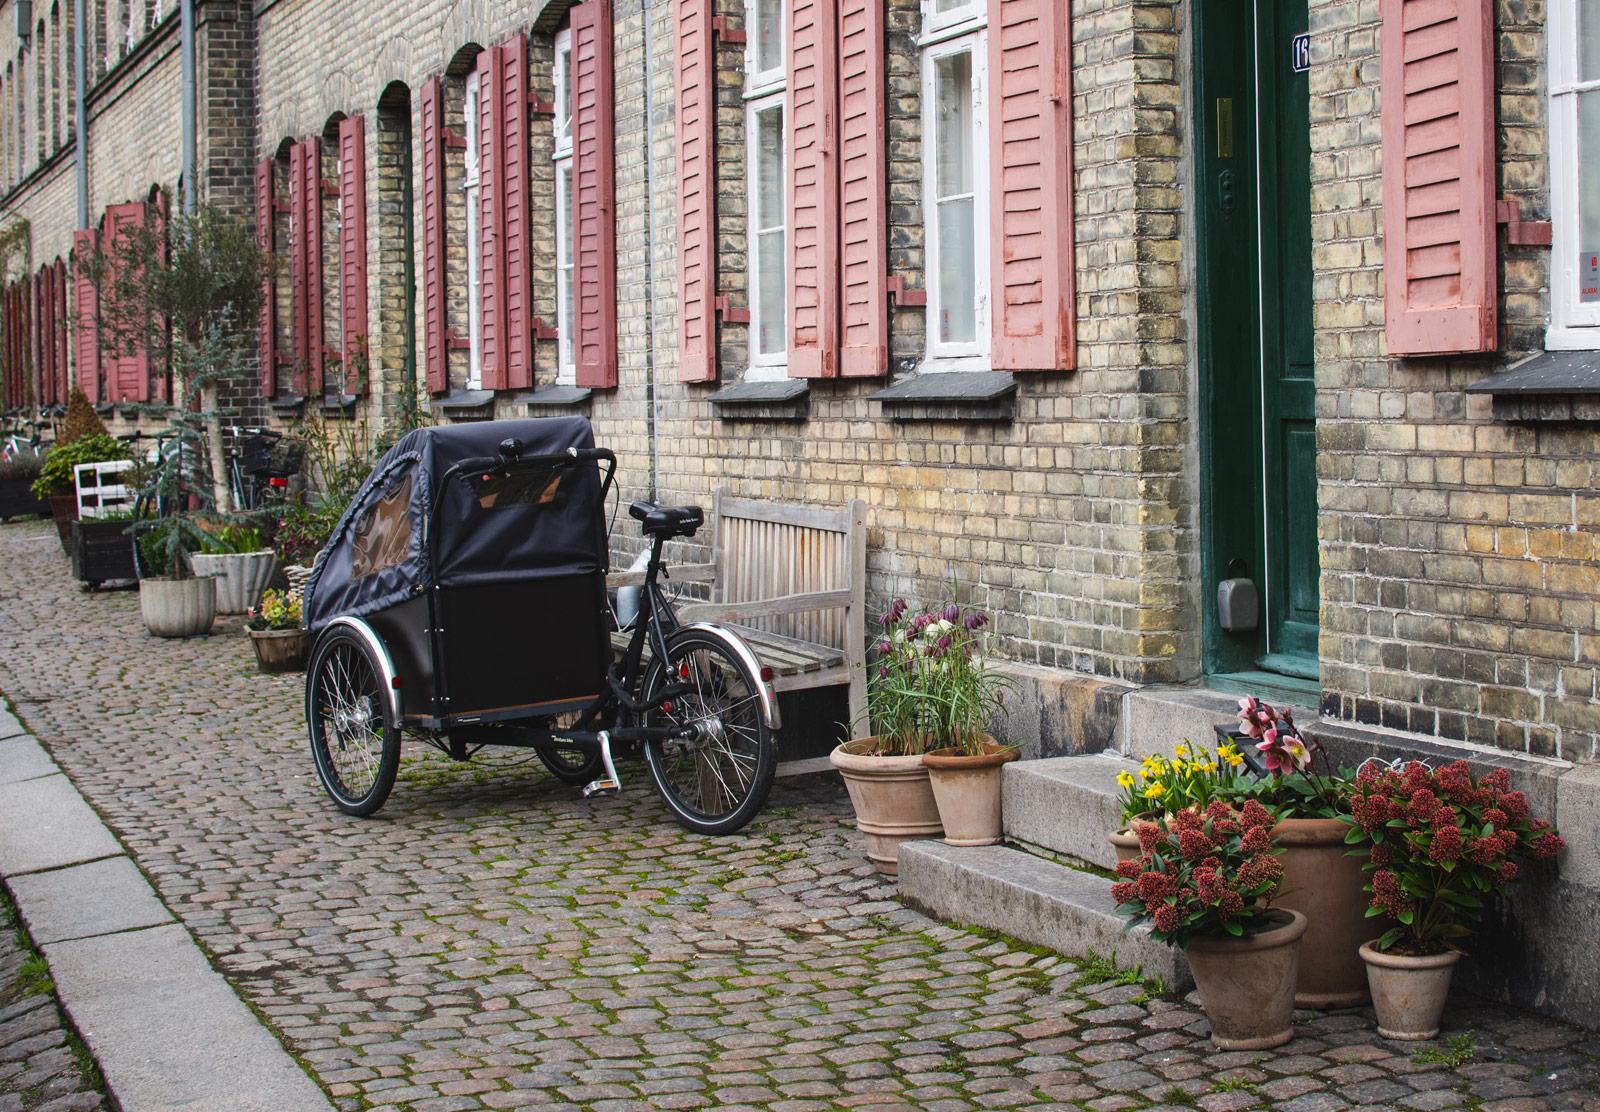 Cargo bike in cobbled street